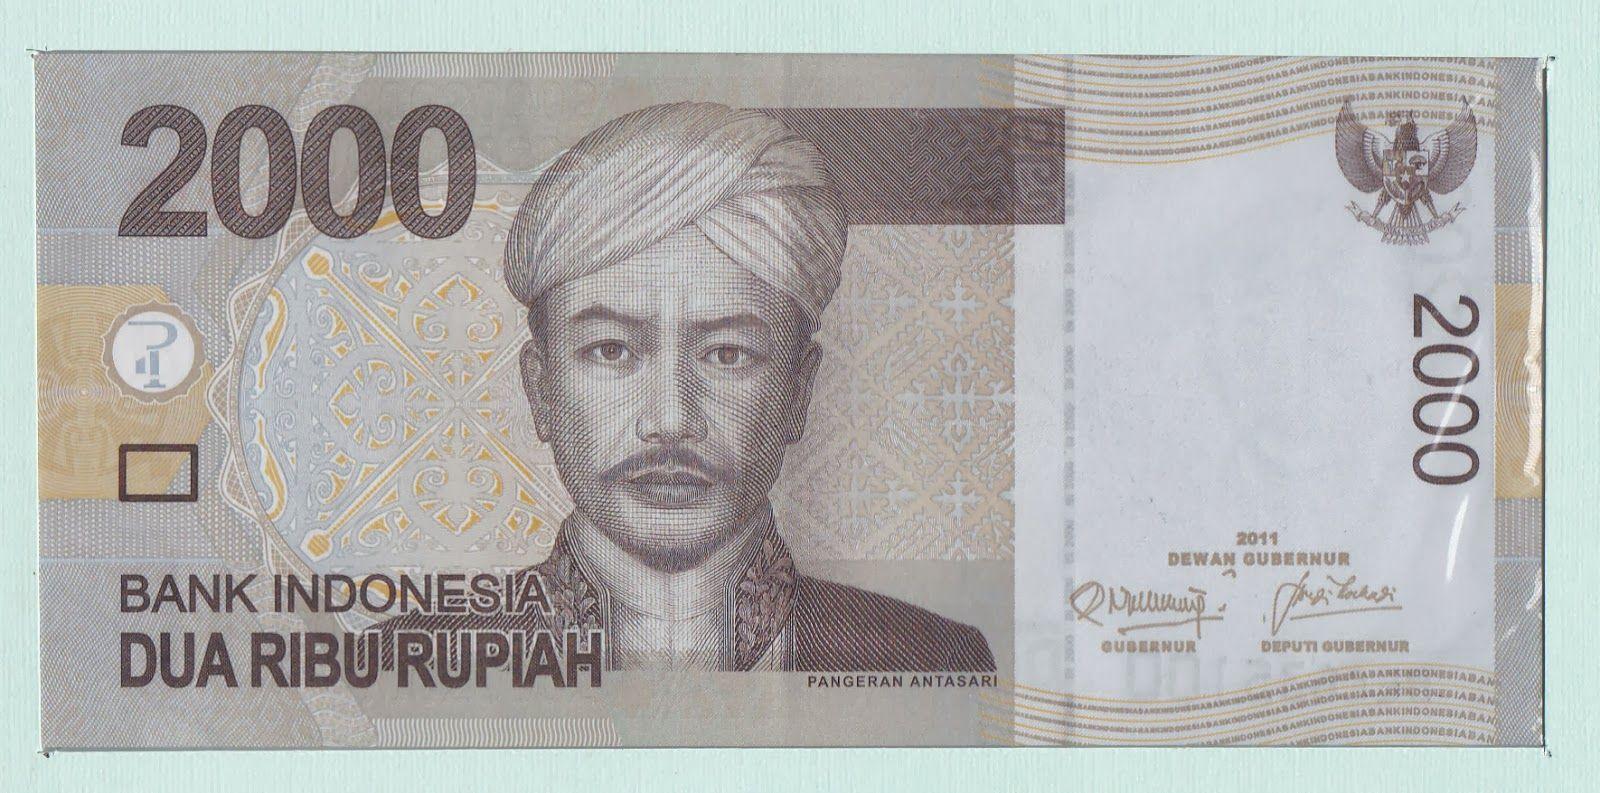 Gambar Pahlawan Pangeran Antasari